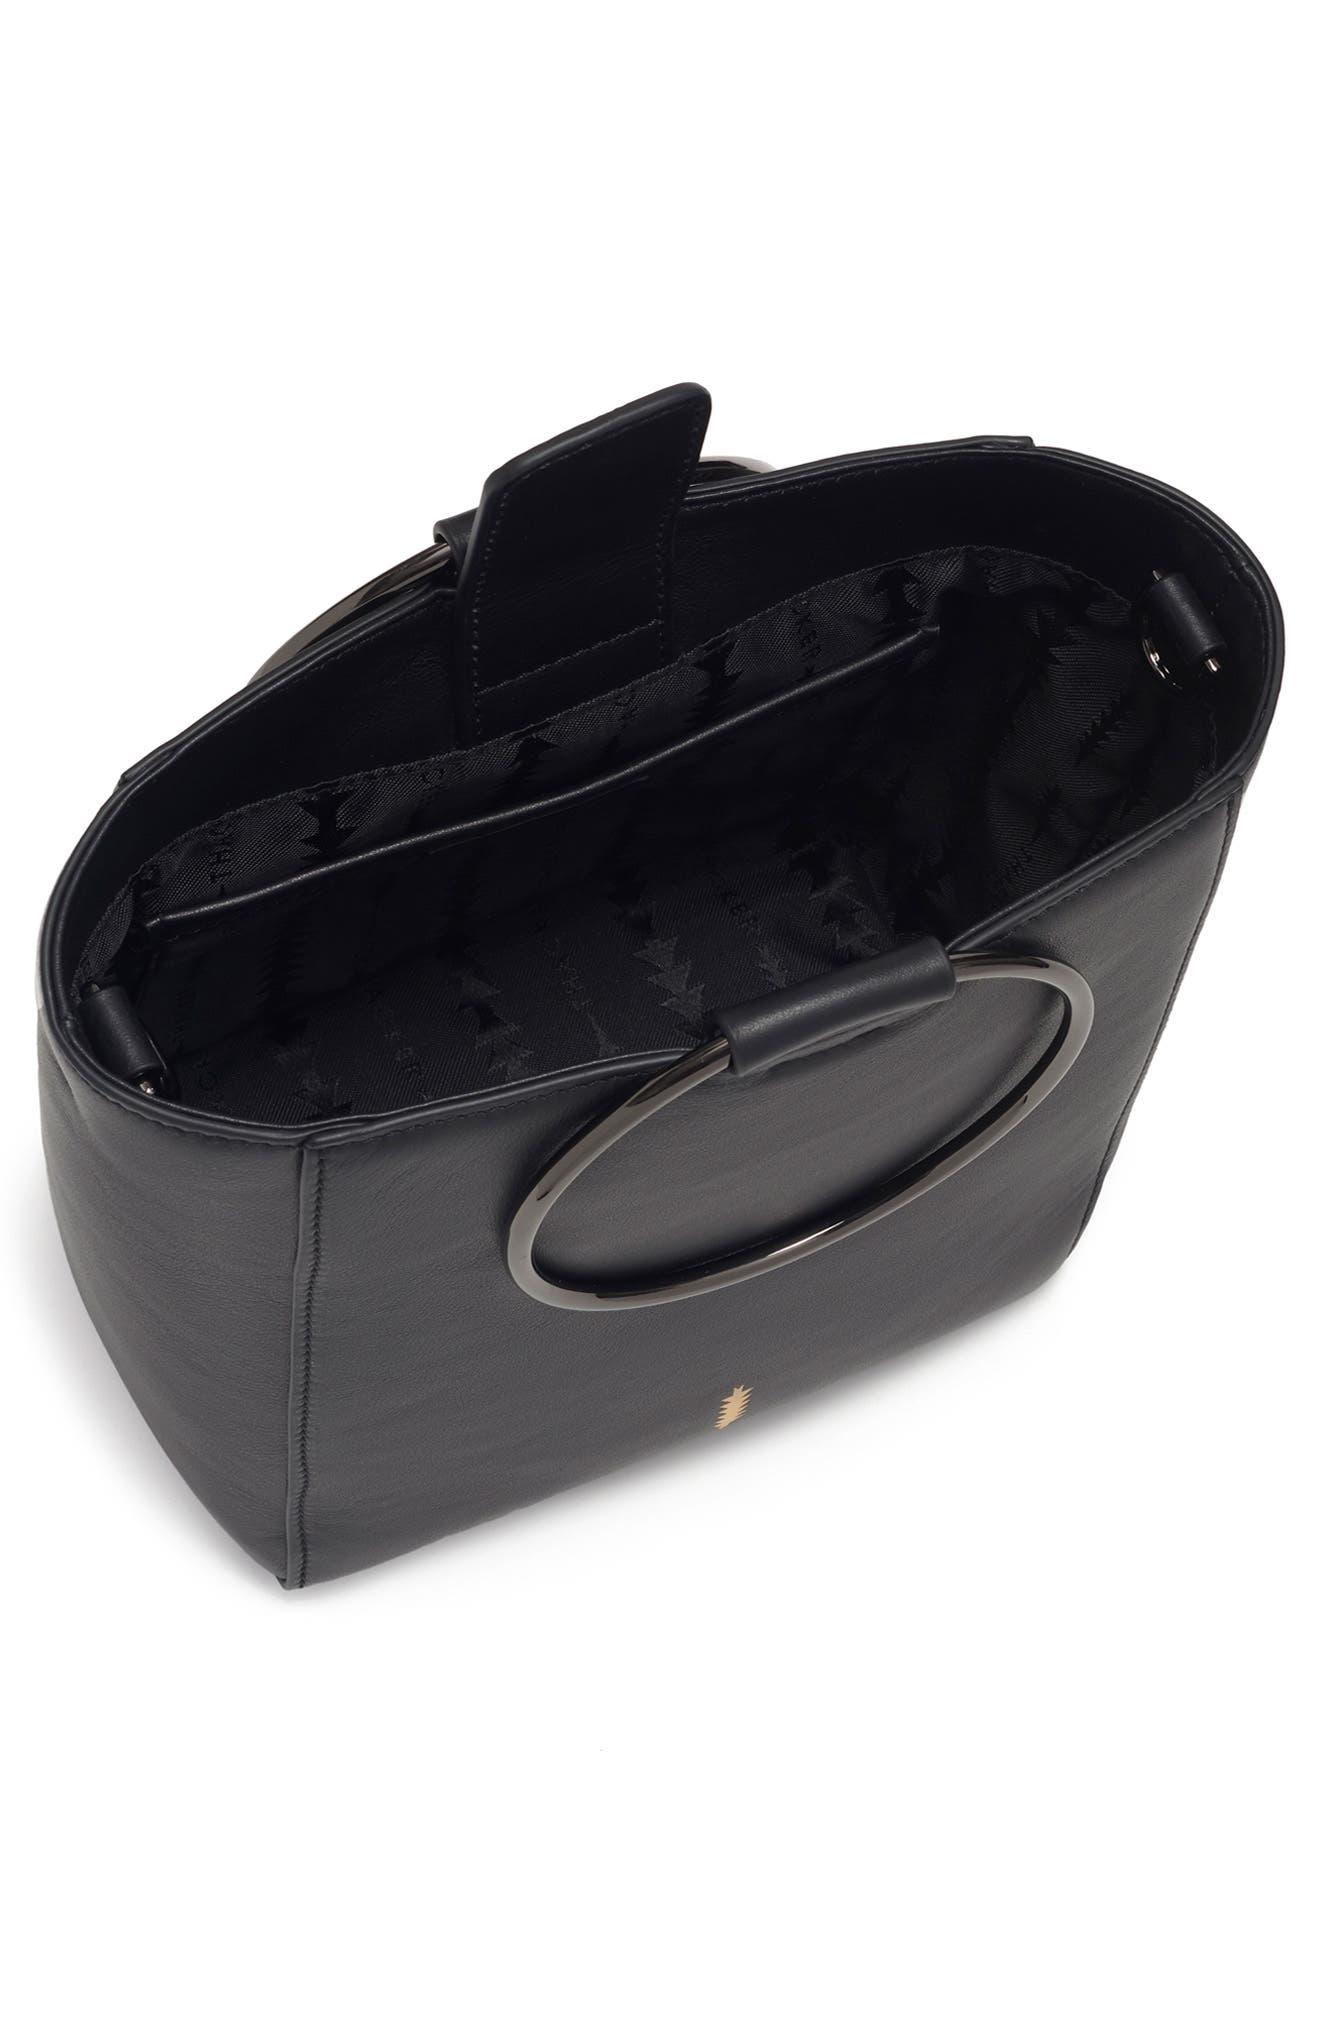 THACKER,                             Le Bucket Leather Bag,                             Alternate thumbnail 4, color,                             BLACK/ GUNMETAL